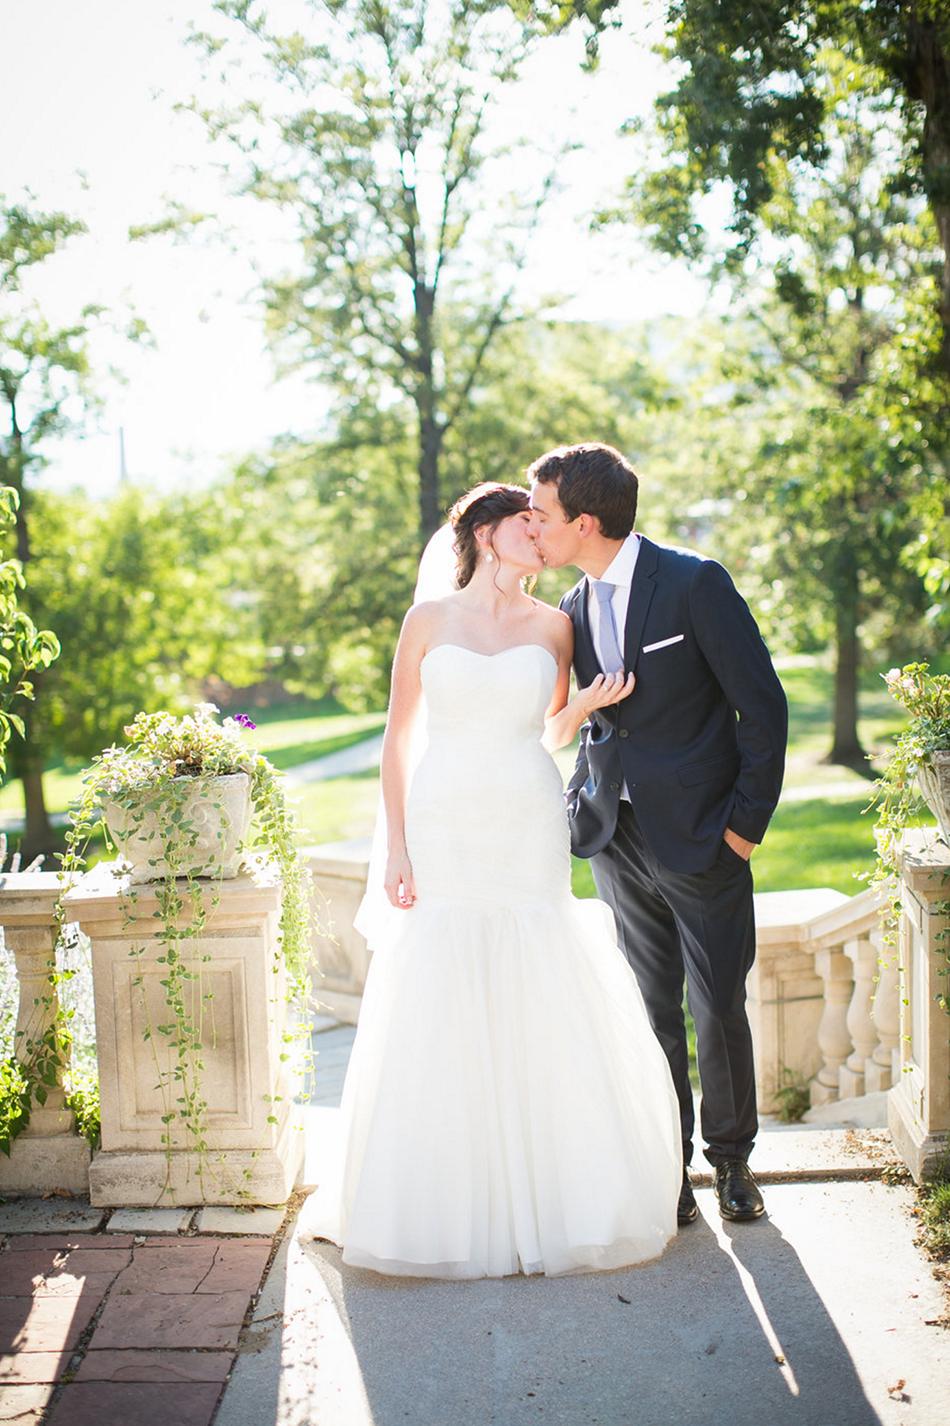 monique_lhuillier_denver_wedding13.jpg